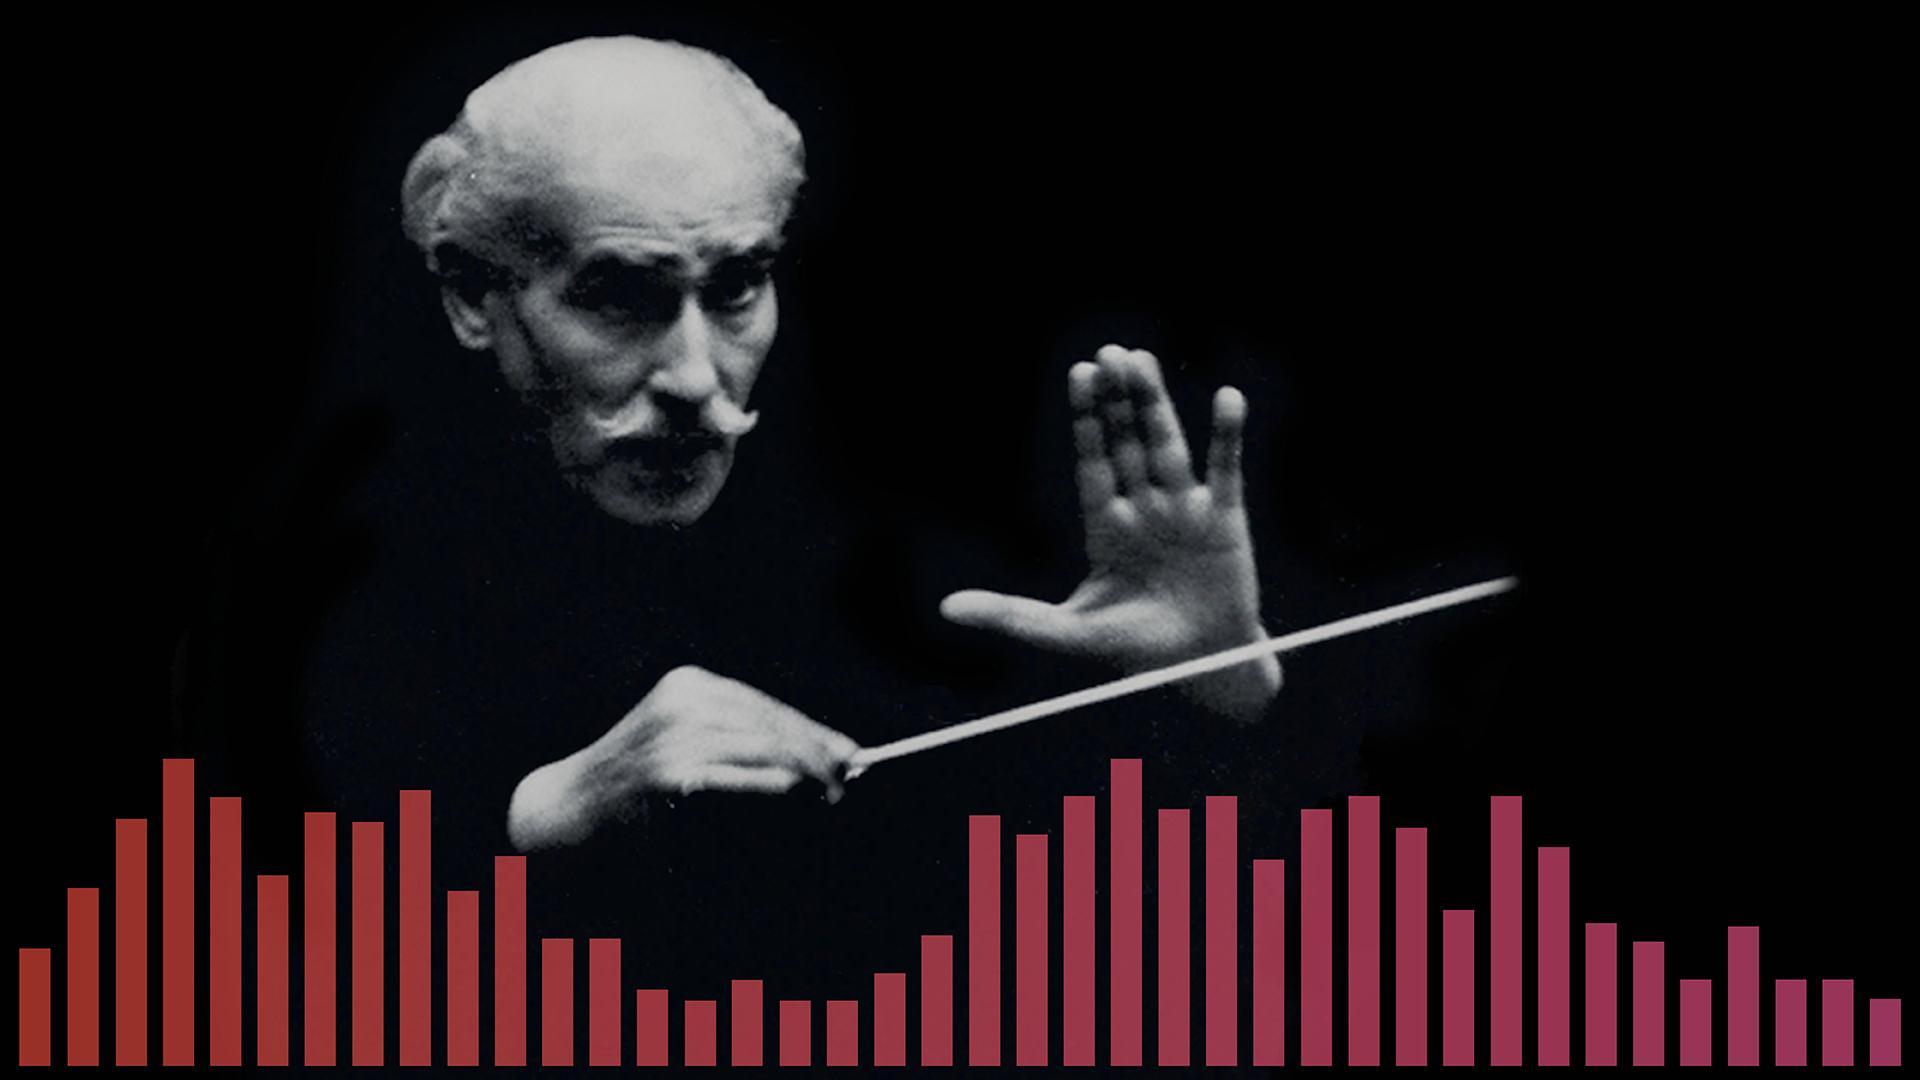 Arturo Toscanini conducting the NBC Symphony Orchestra, n.d.